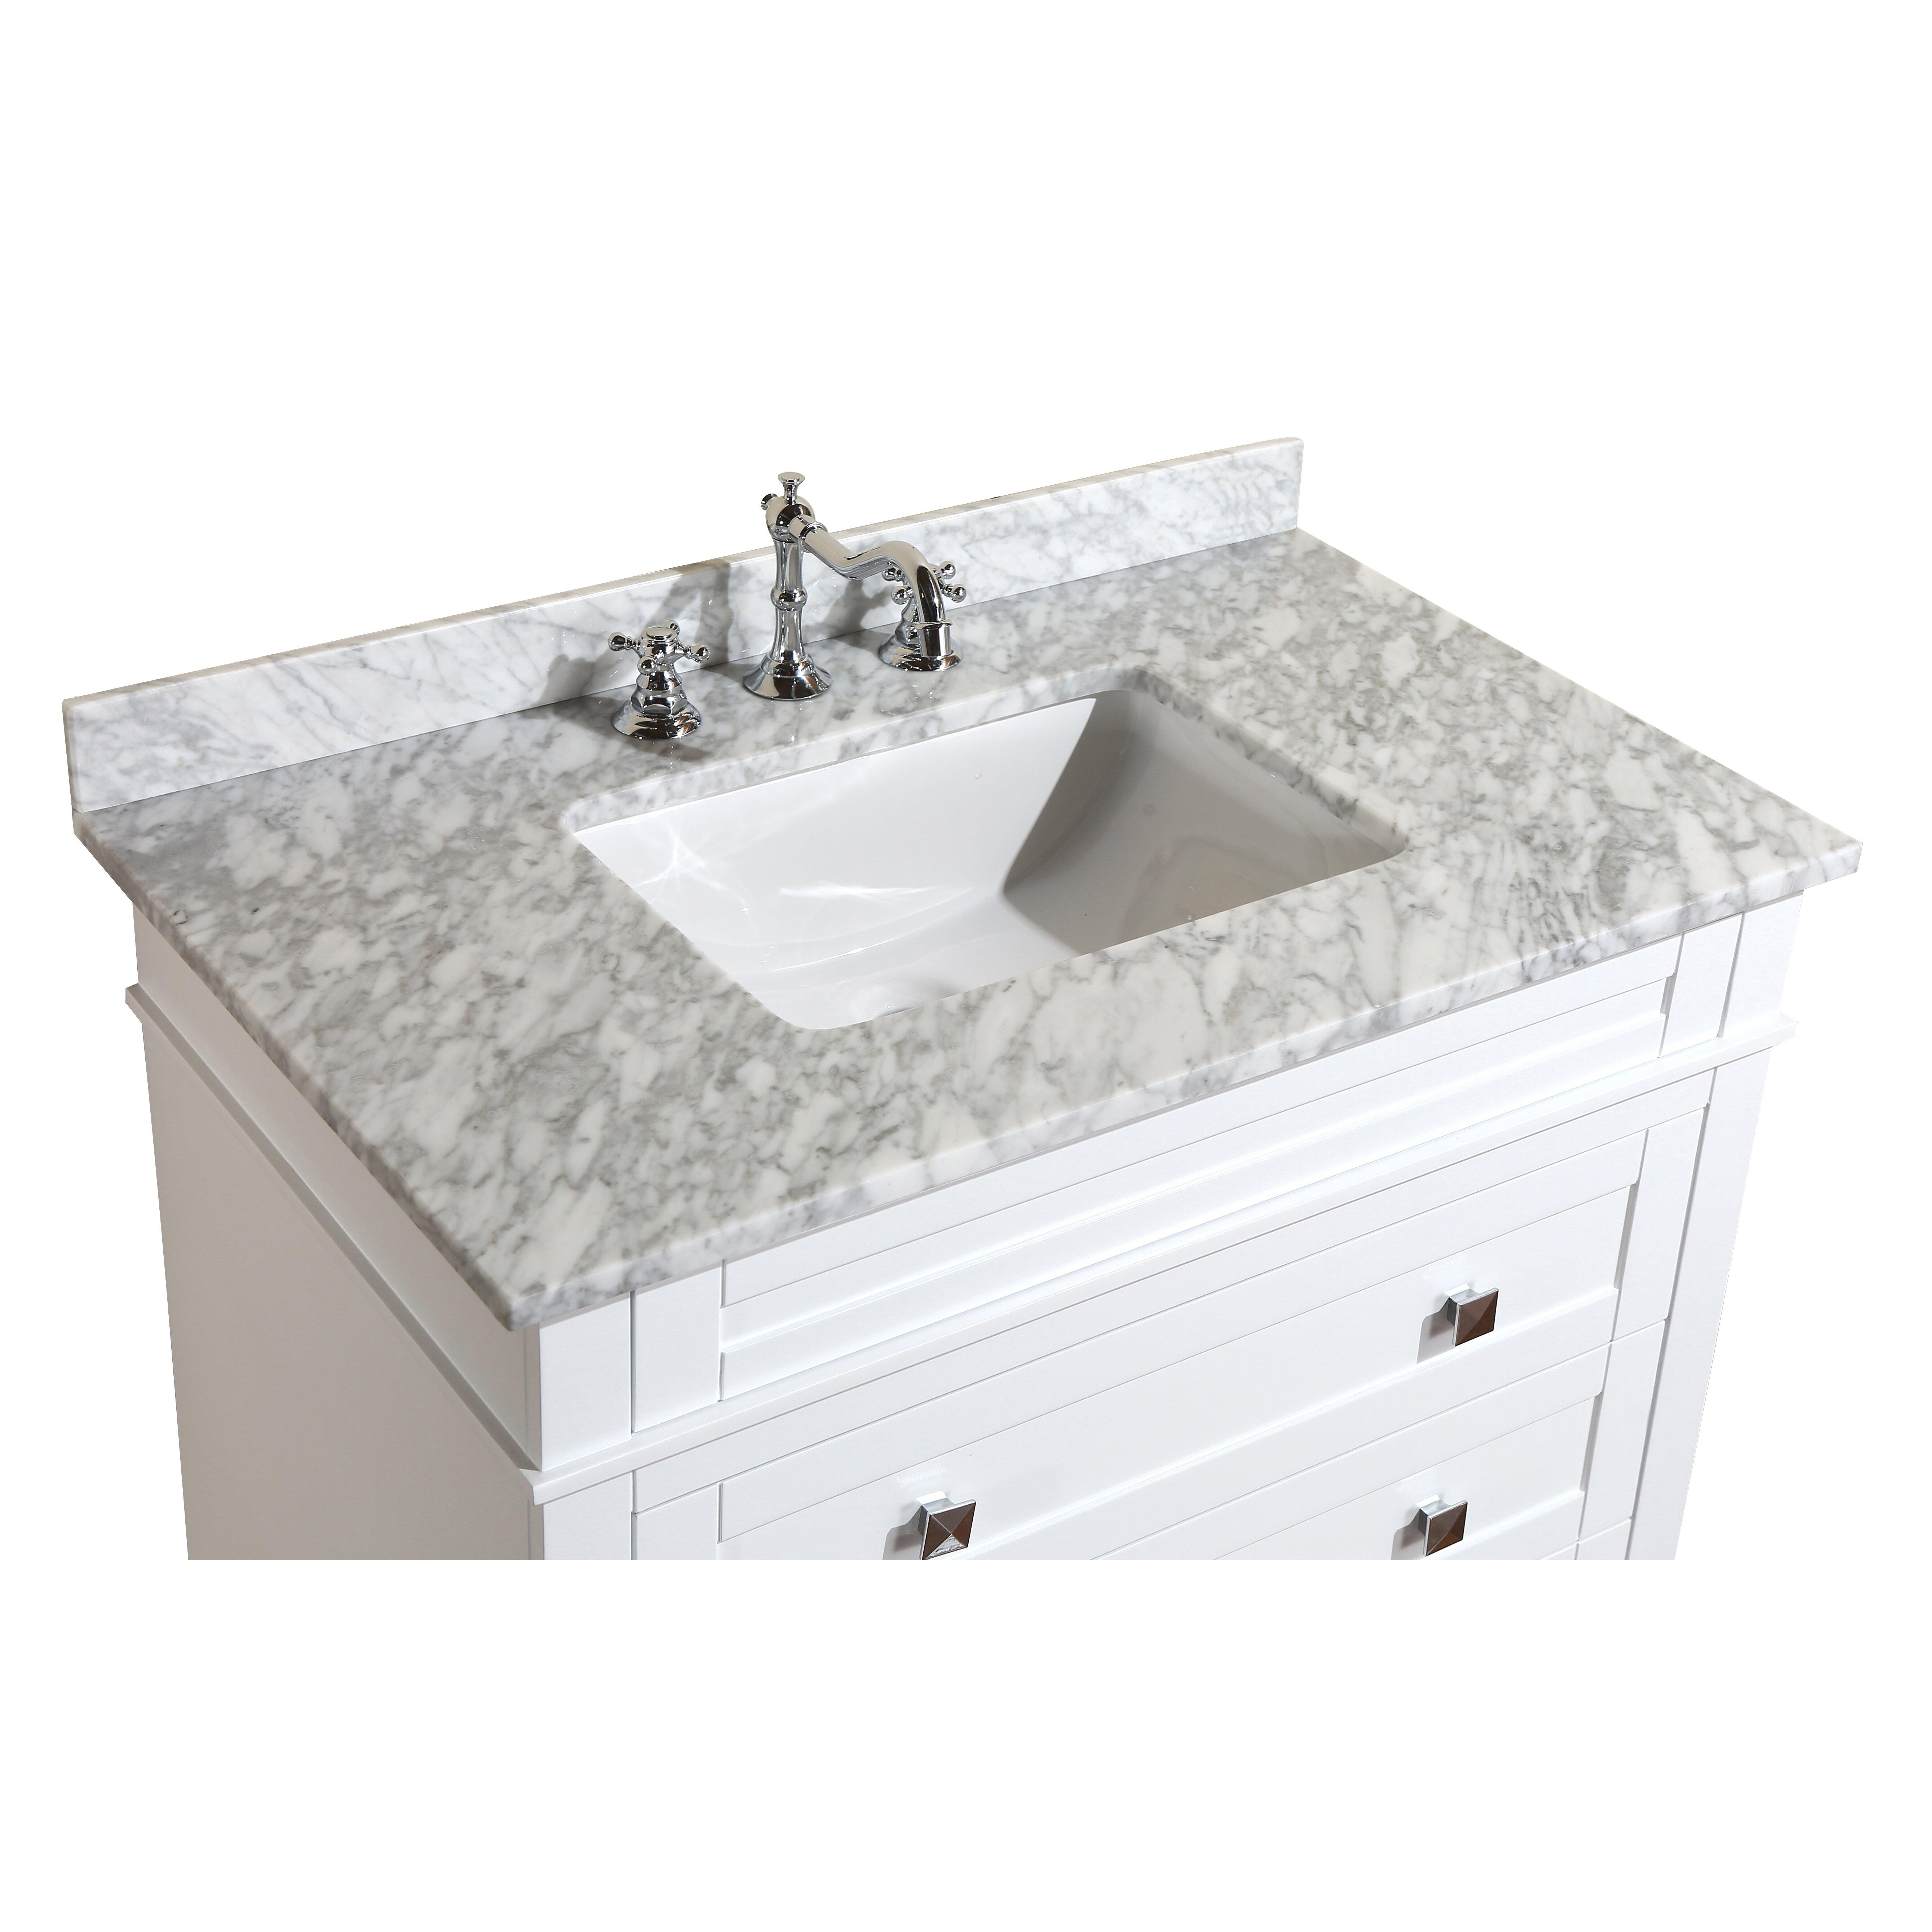 eleanor singles 🛍 best price reviews eleanor 30 single bathroom vanity set for price bargain 🛍 online shopping eleanor 30 single bathroom vanity set 🛍 expert reviews eleanor.